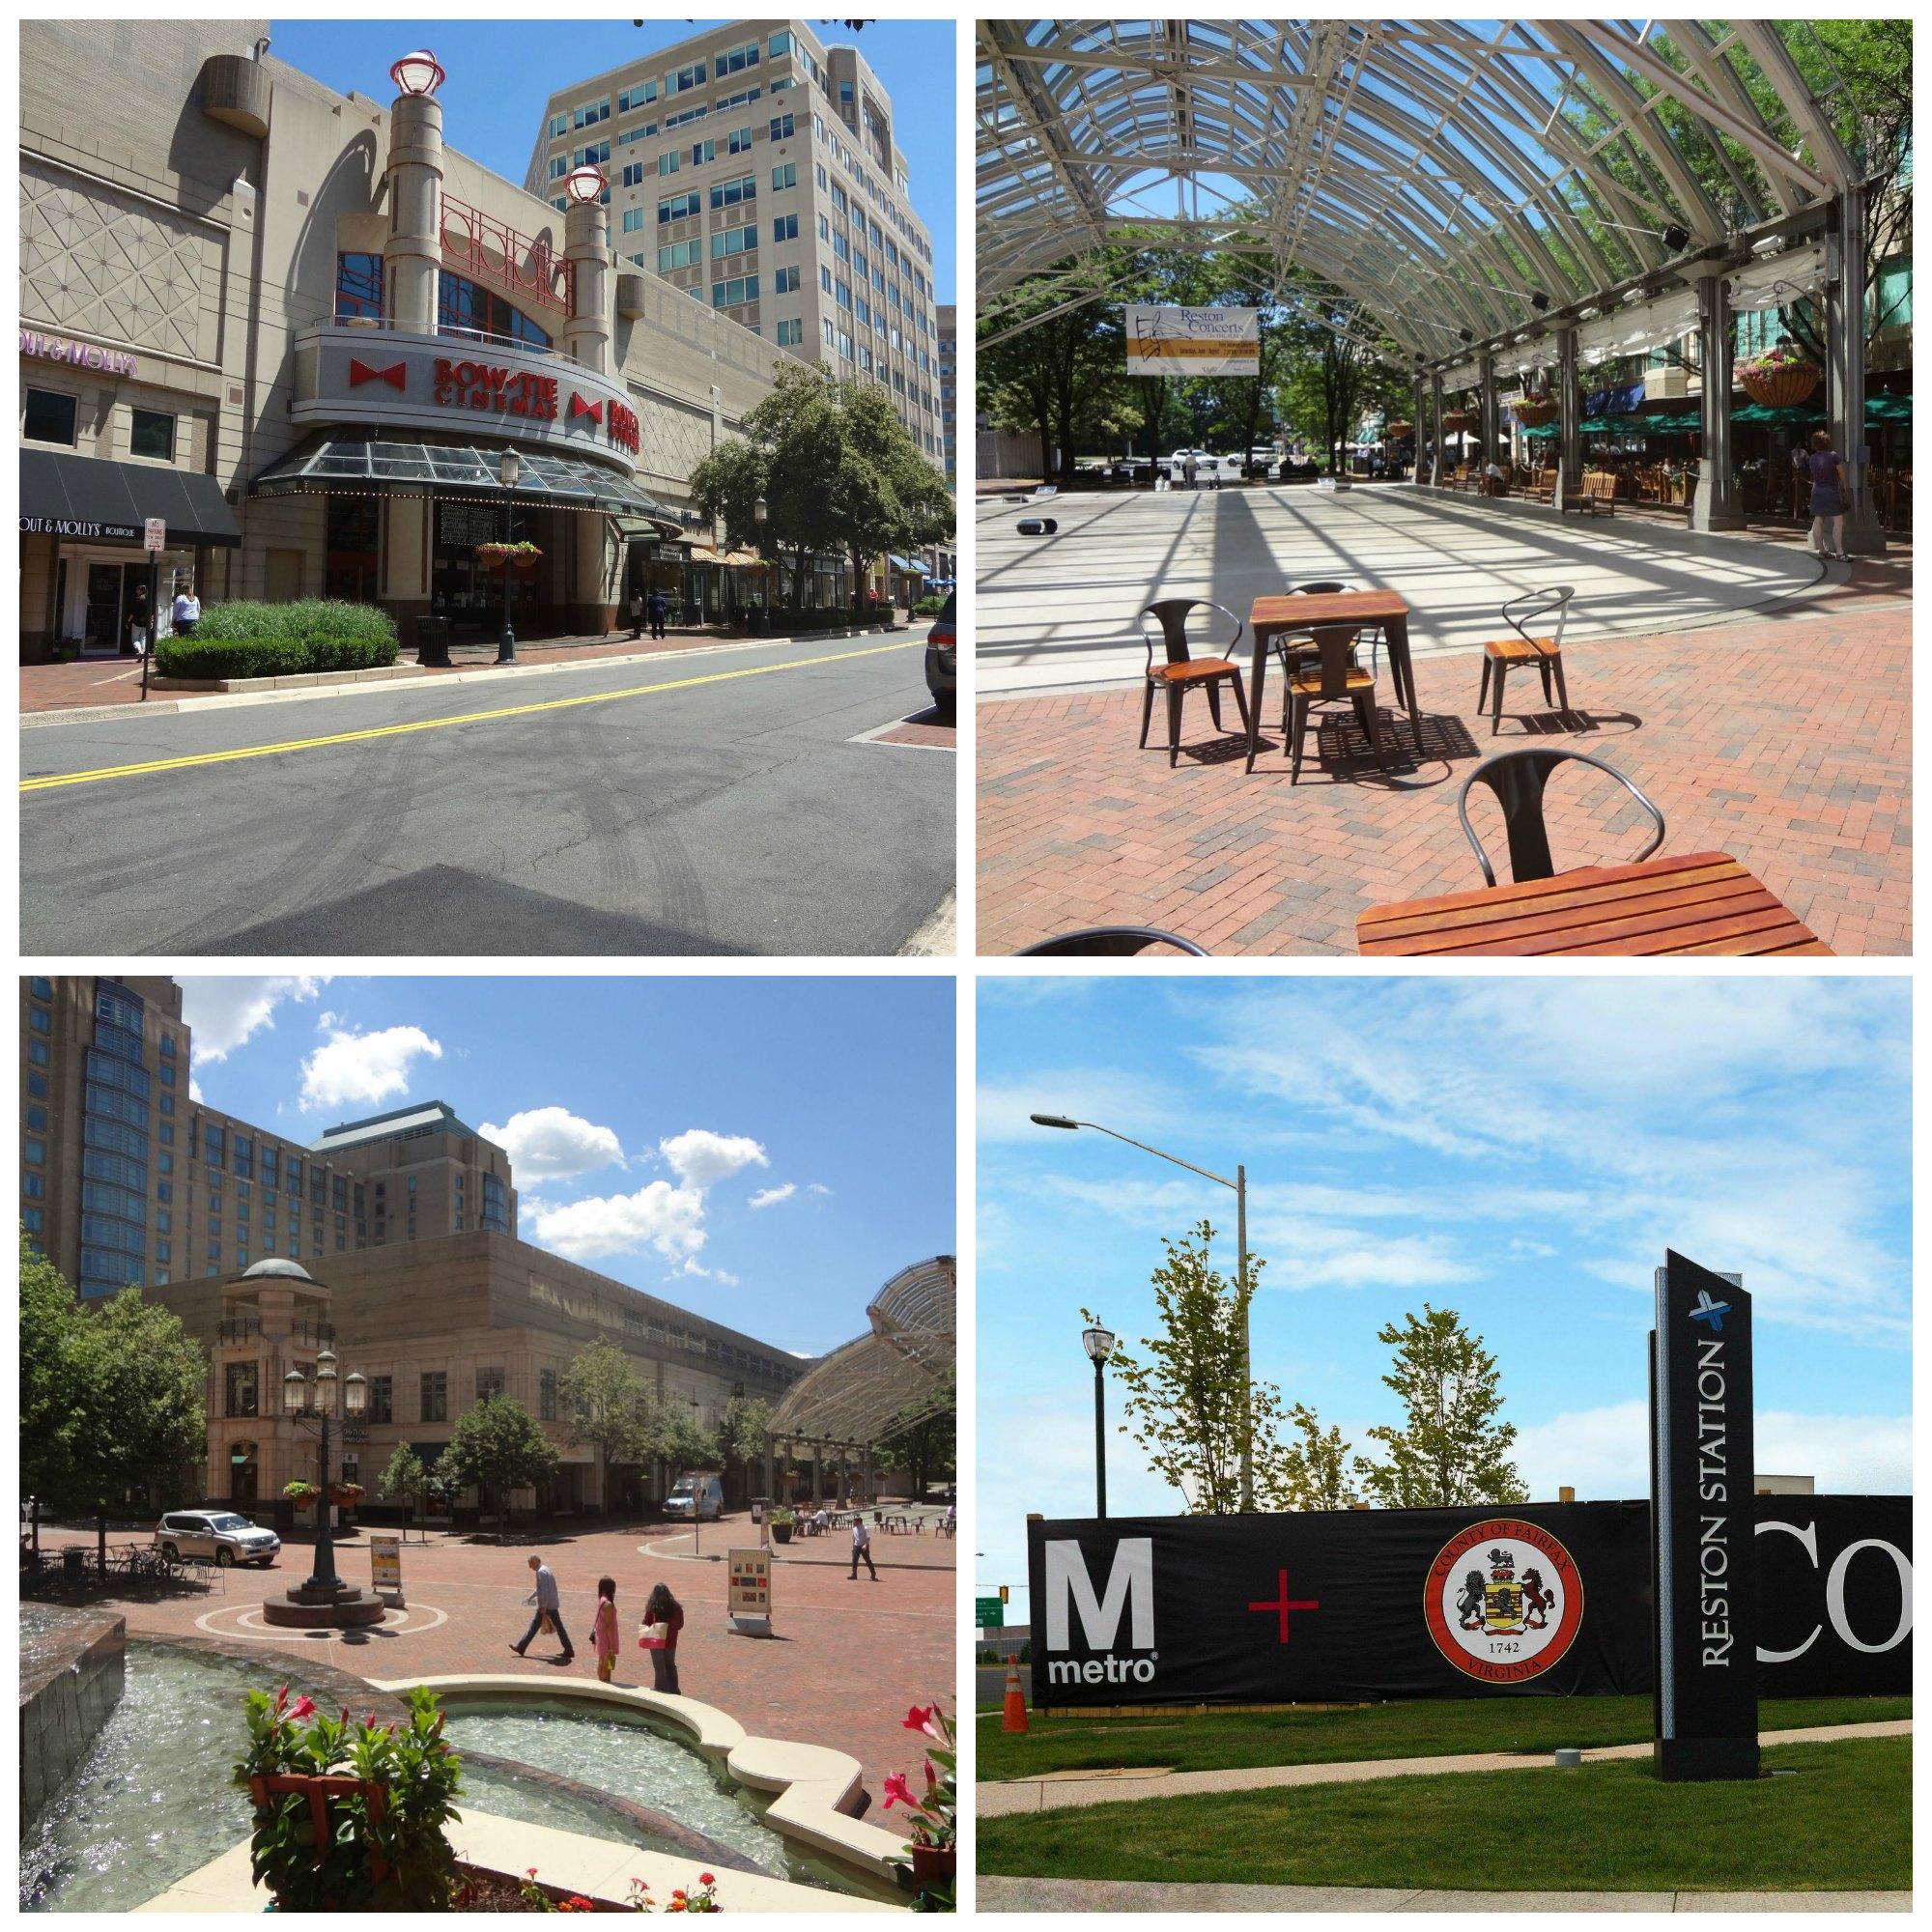 12001 Market St #448- Reston Town Center and Metro